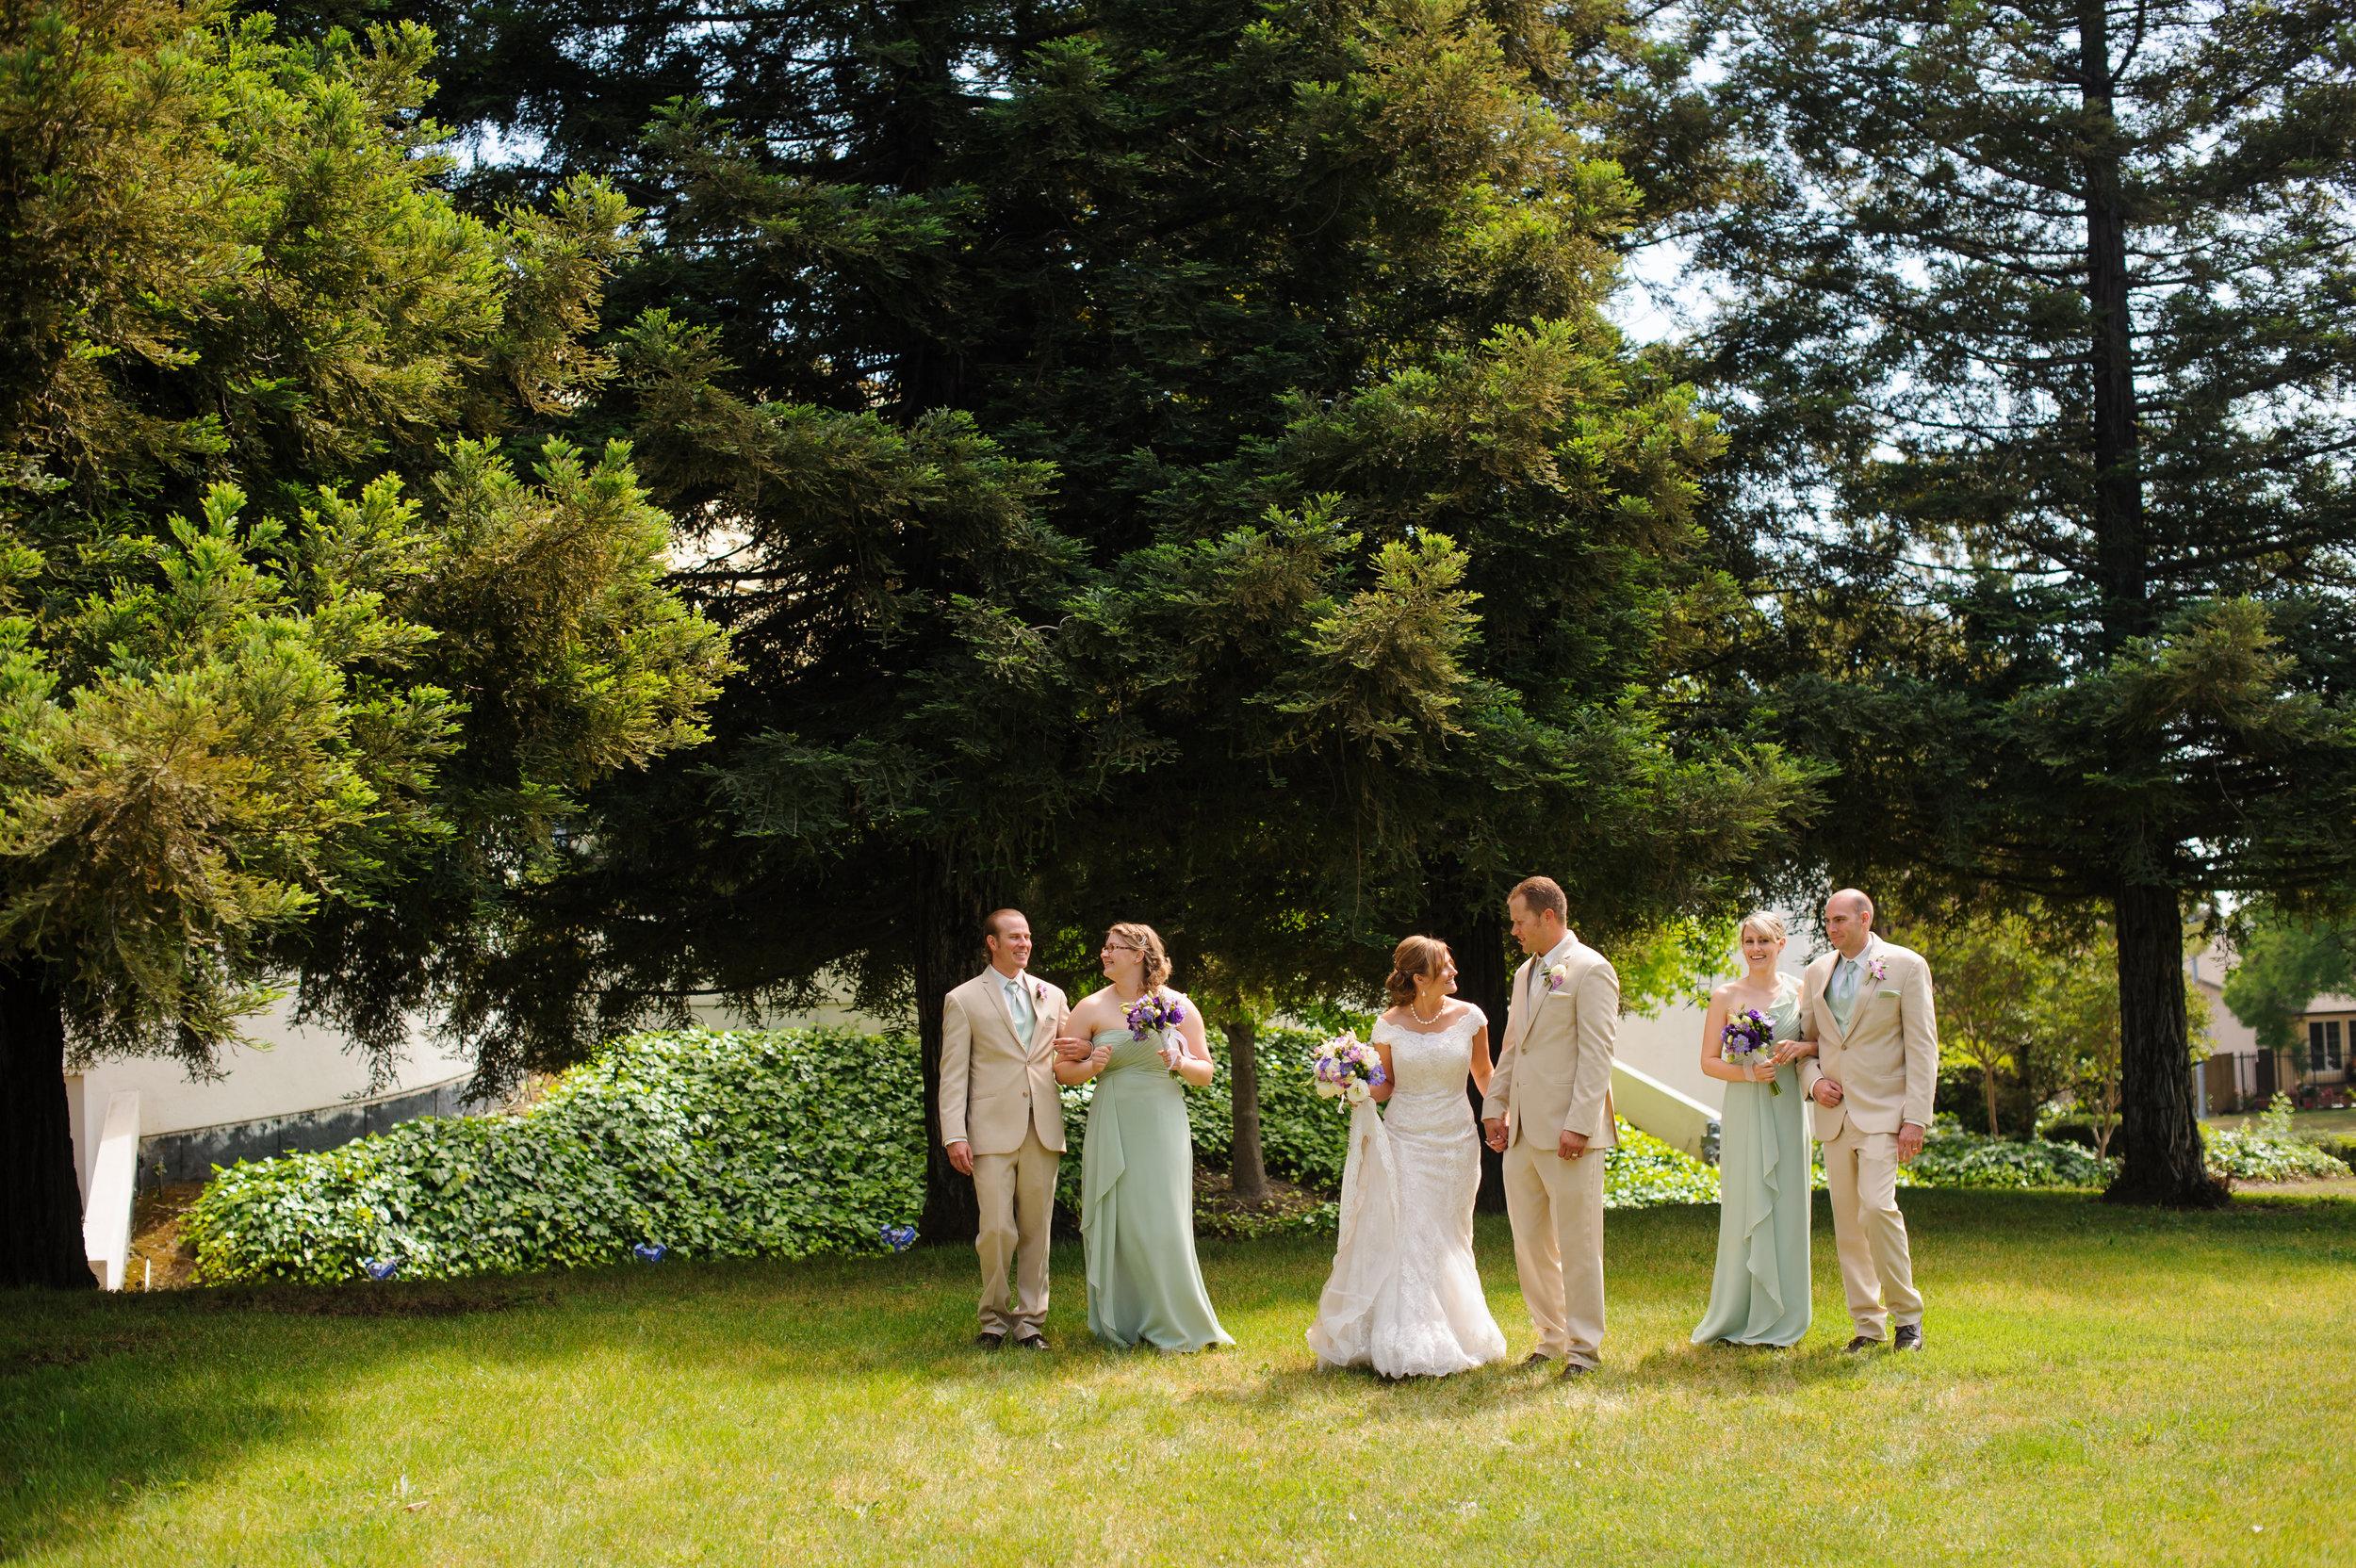 danielle-ross-014-sacramento-wedding-photographer-katherine-nicole-photography.JPG